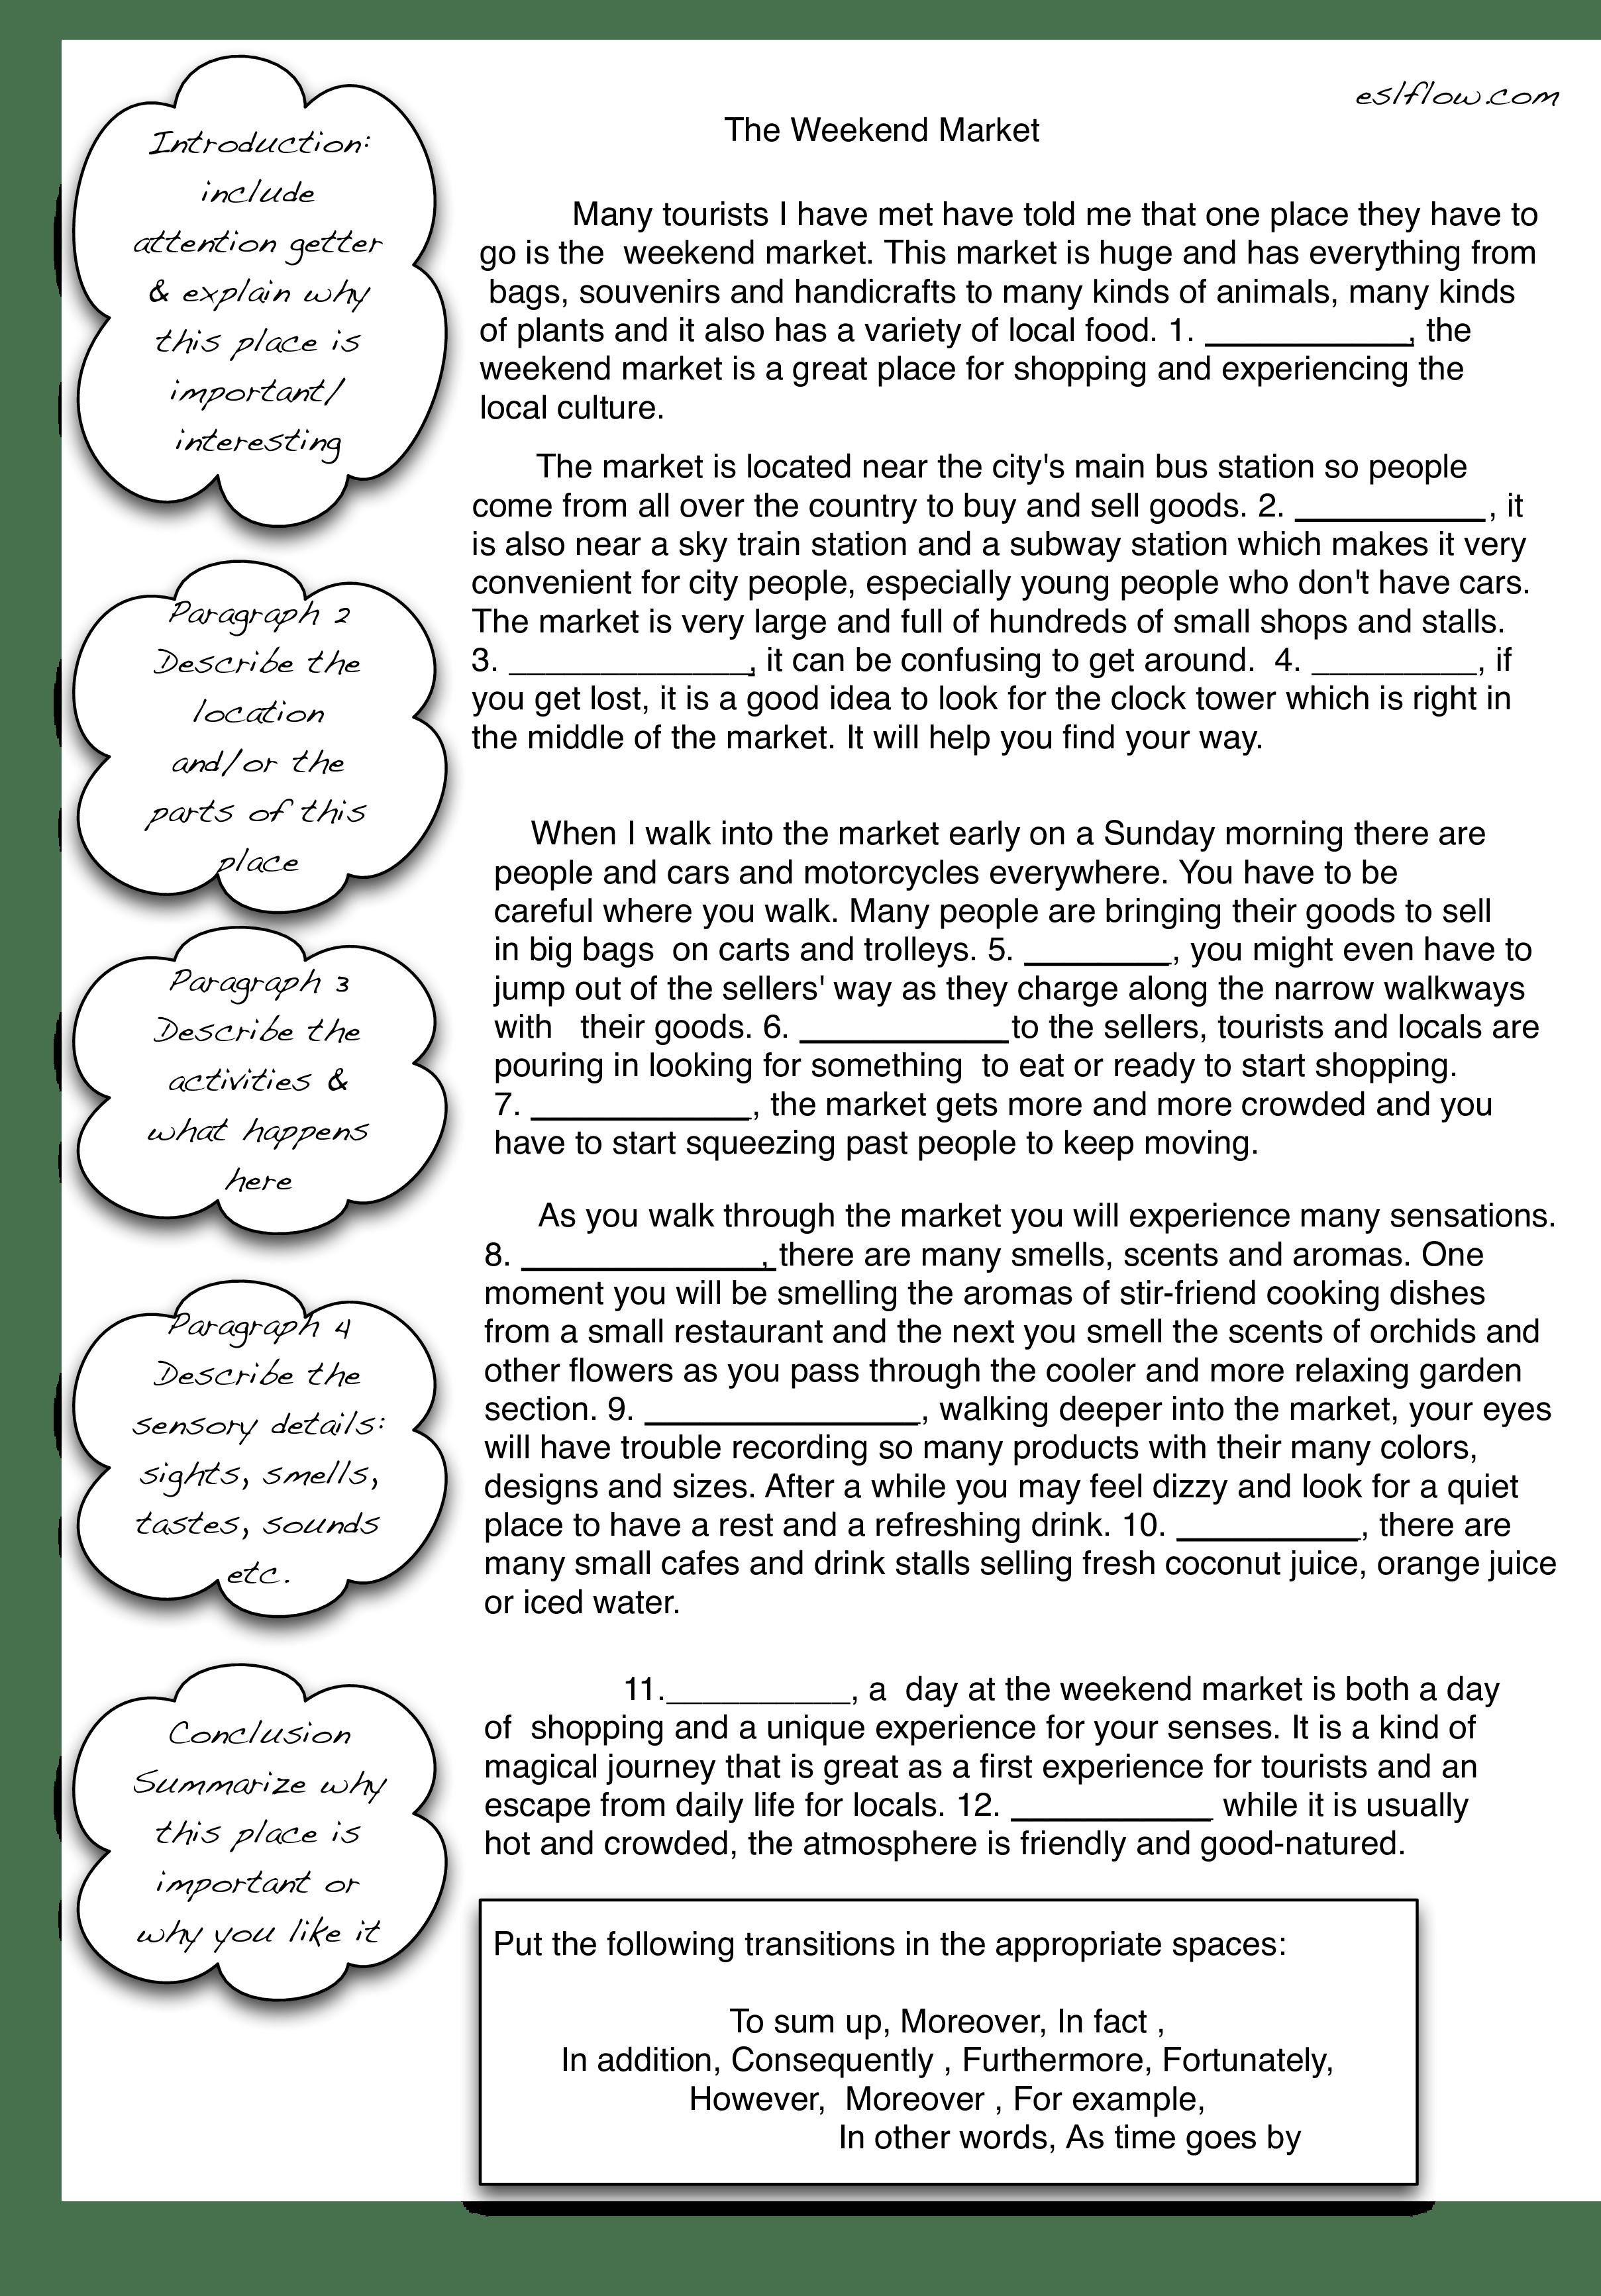 Sample Short Descriptive Essay